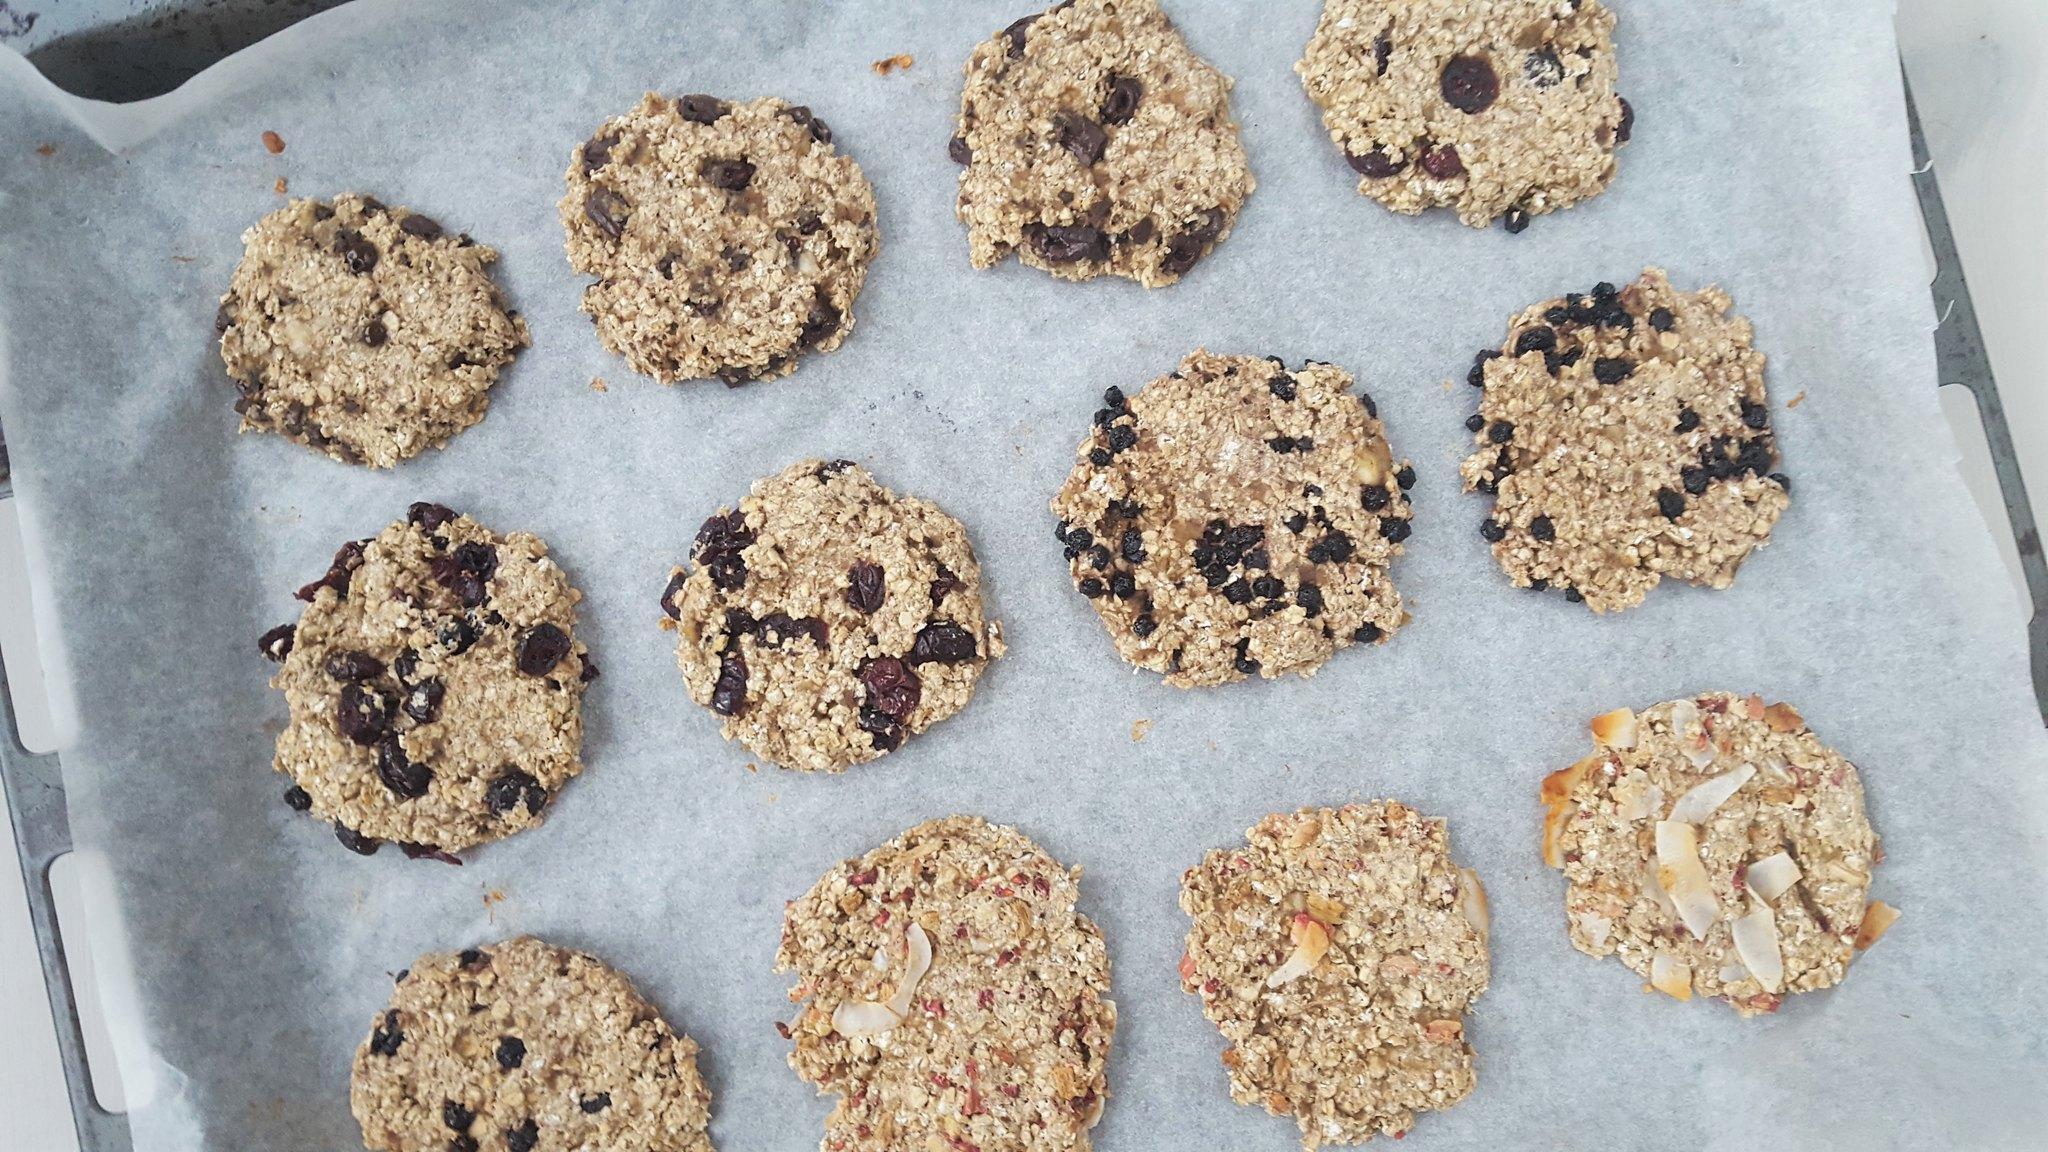 Recipe for Homemade Healthy Banana-oat Cookies